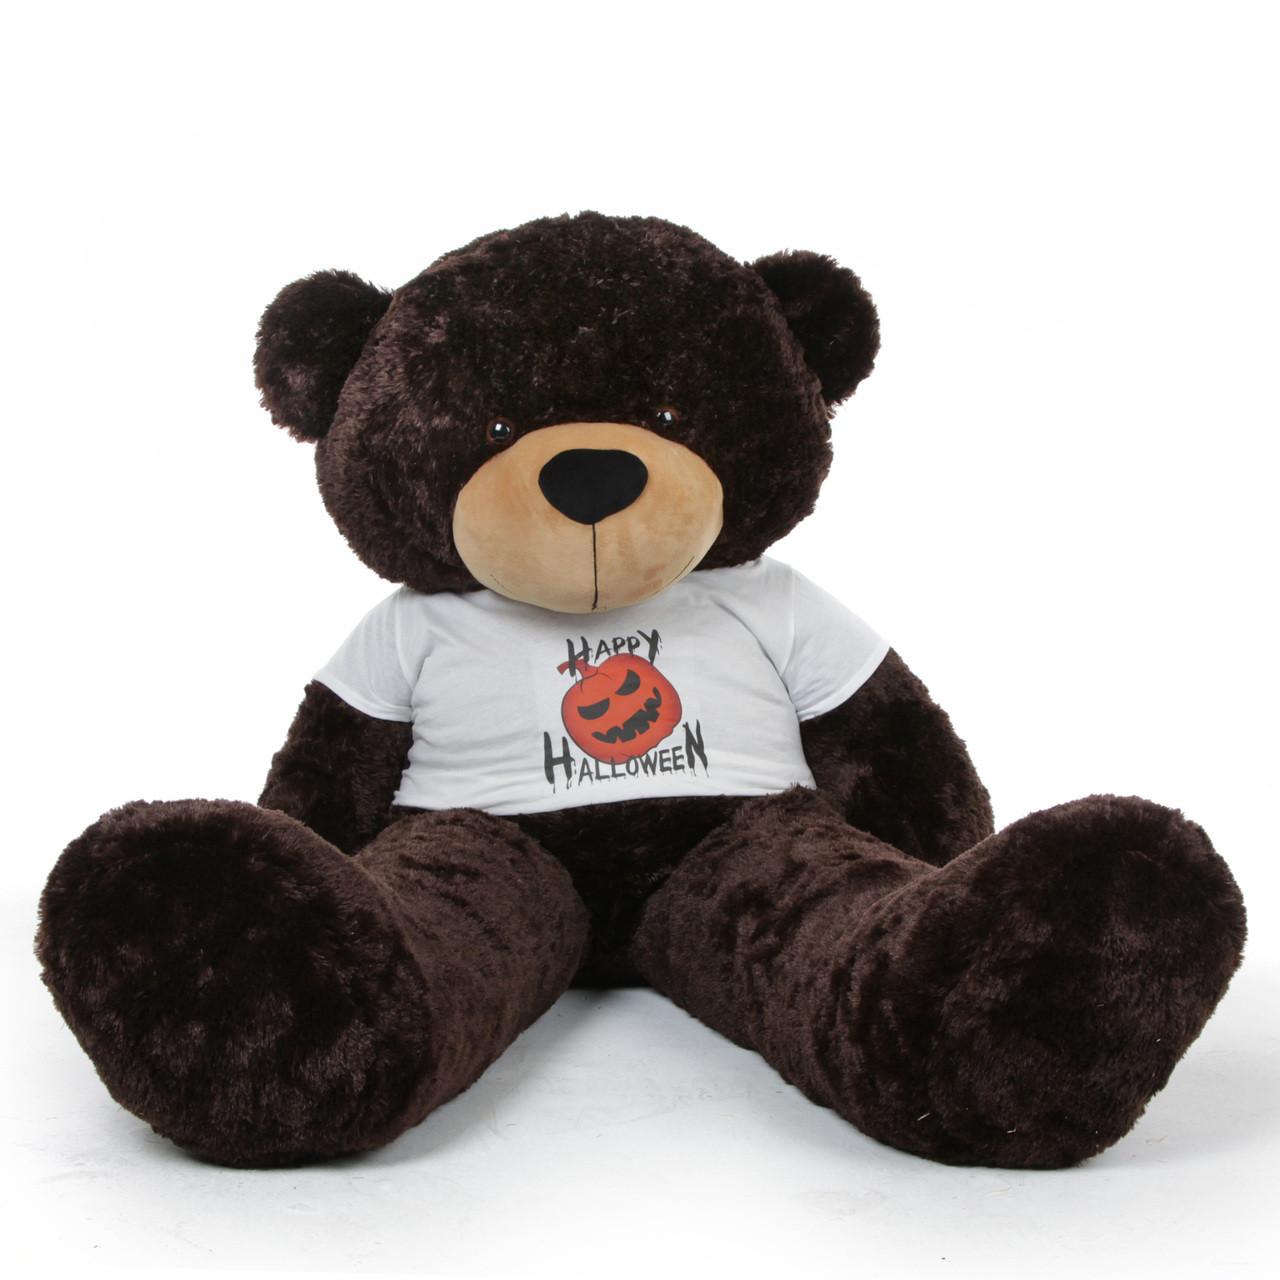 Brownie Cuddles Halloween Giant Teddy Bear With Happy